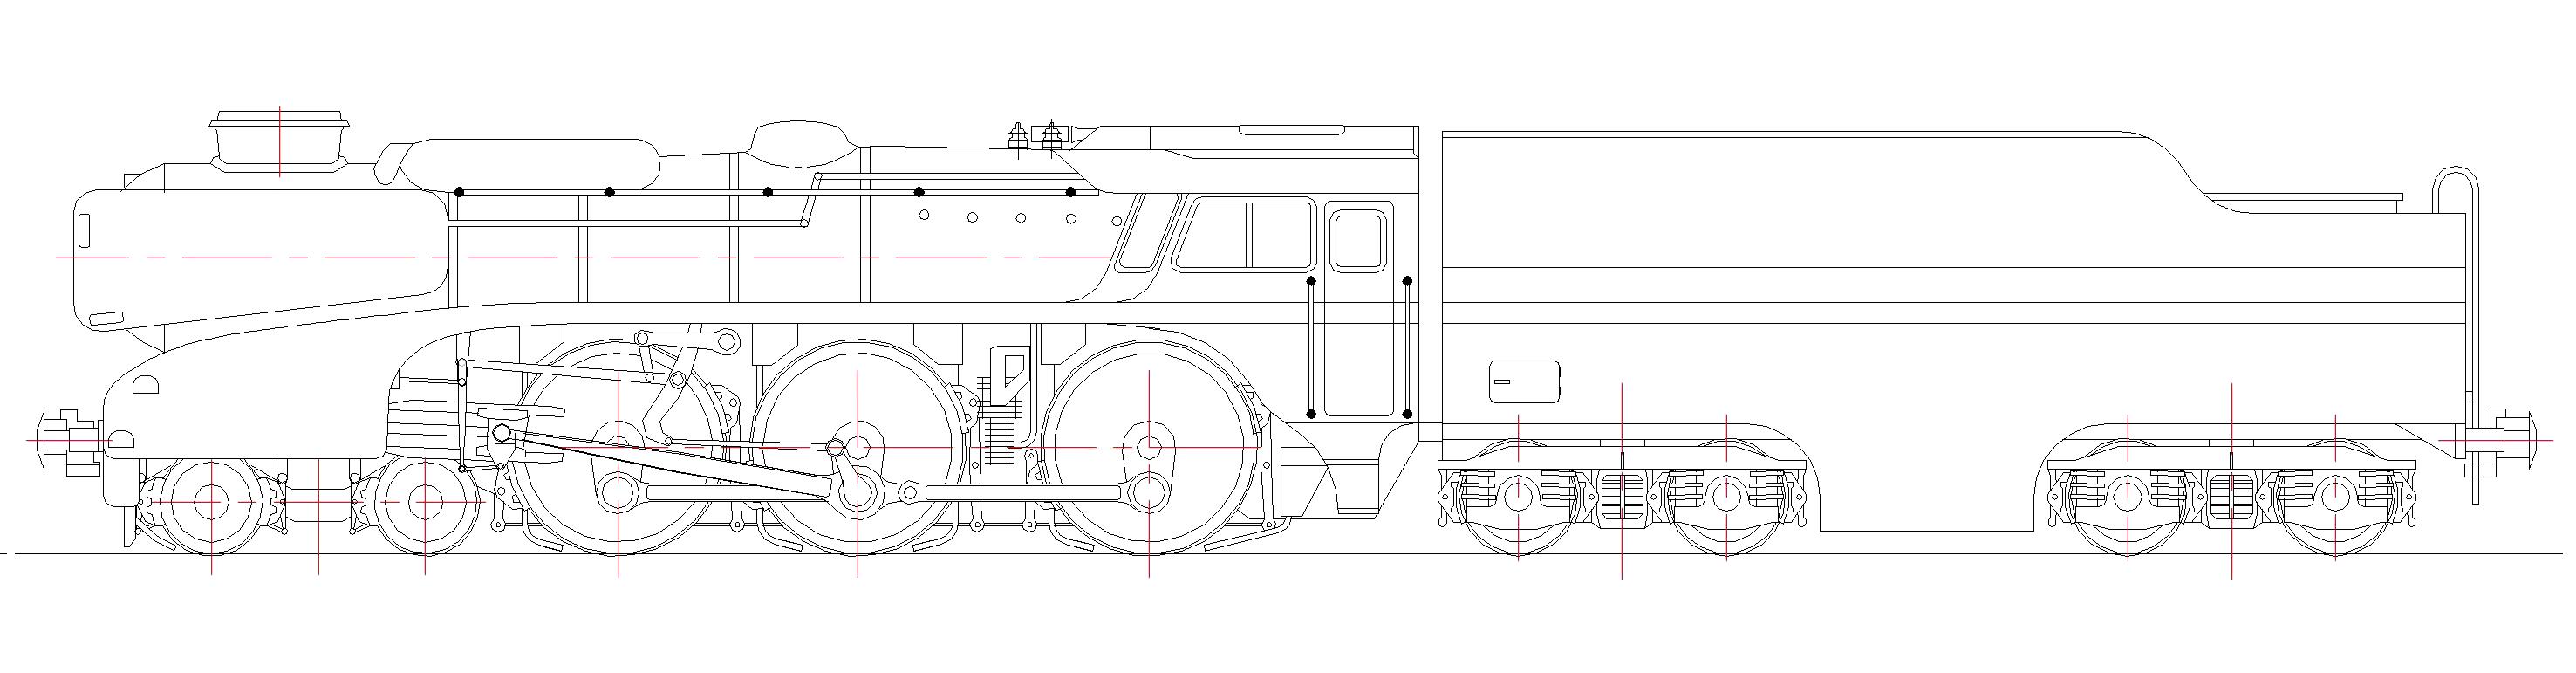 Image Result For Santa Train Coloring